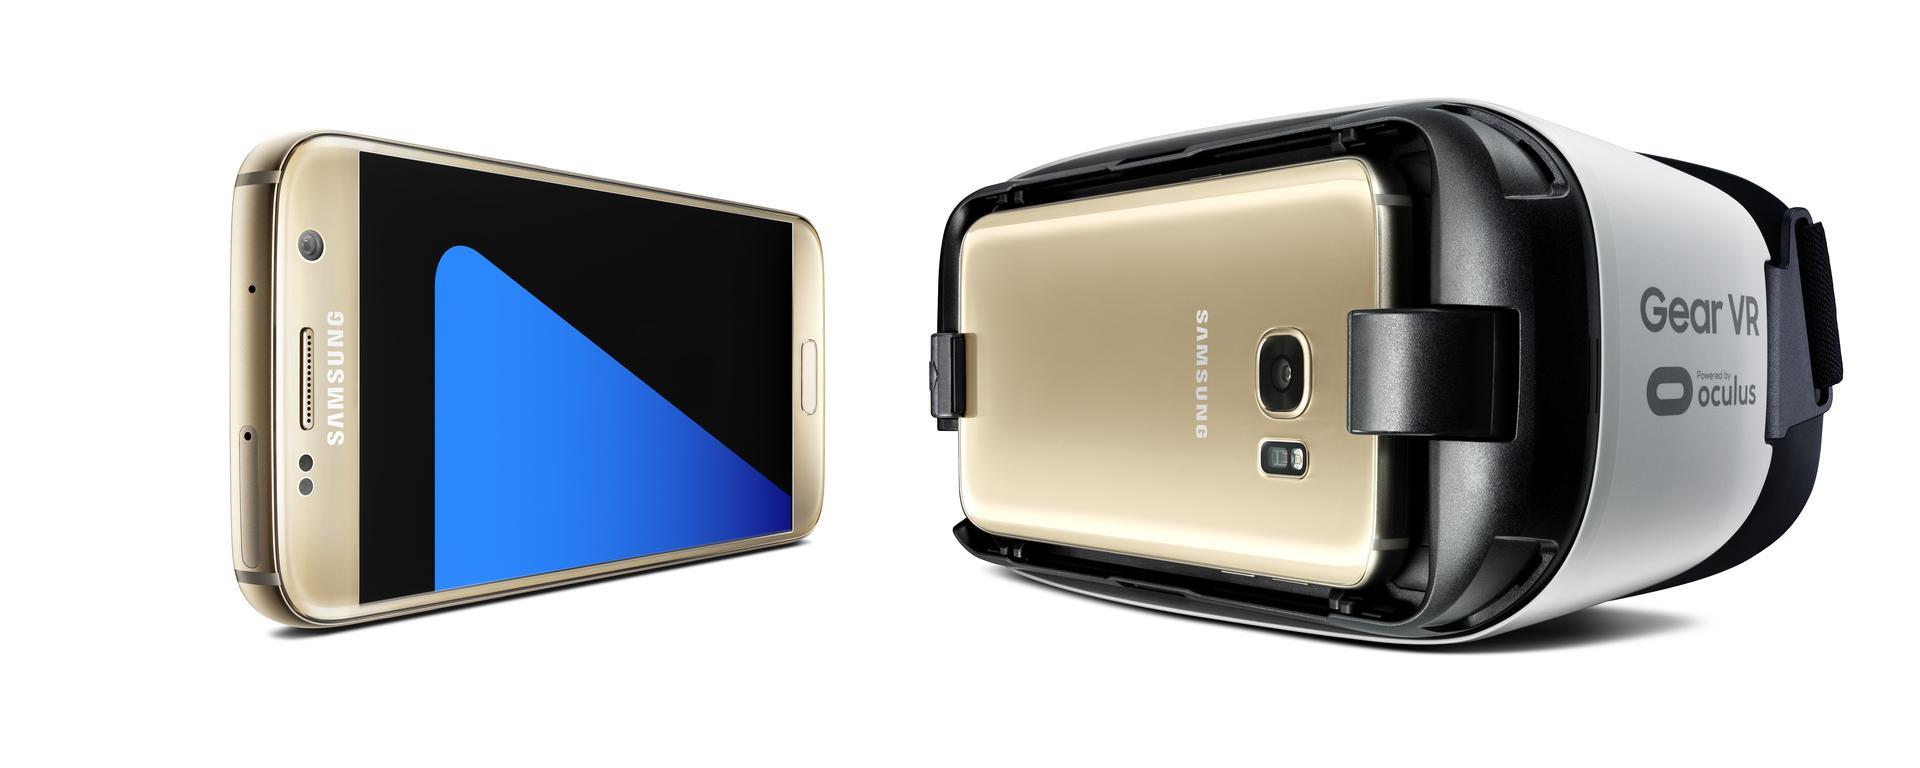 Samsung Galaxy S7 and Samsung Gear VR